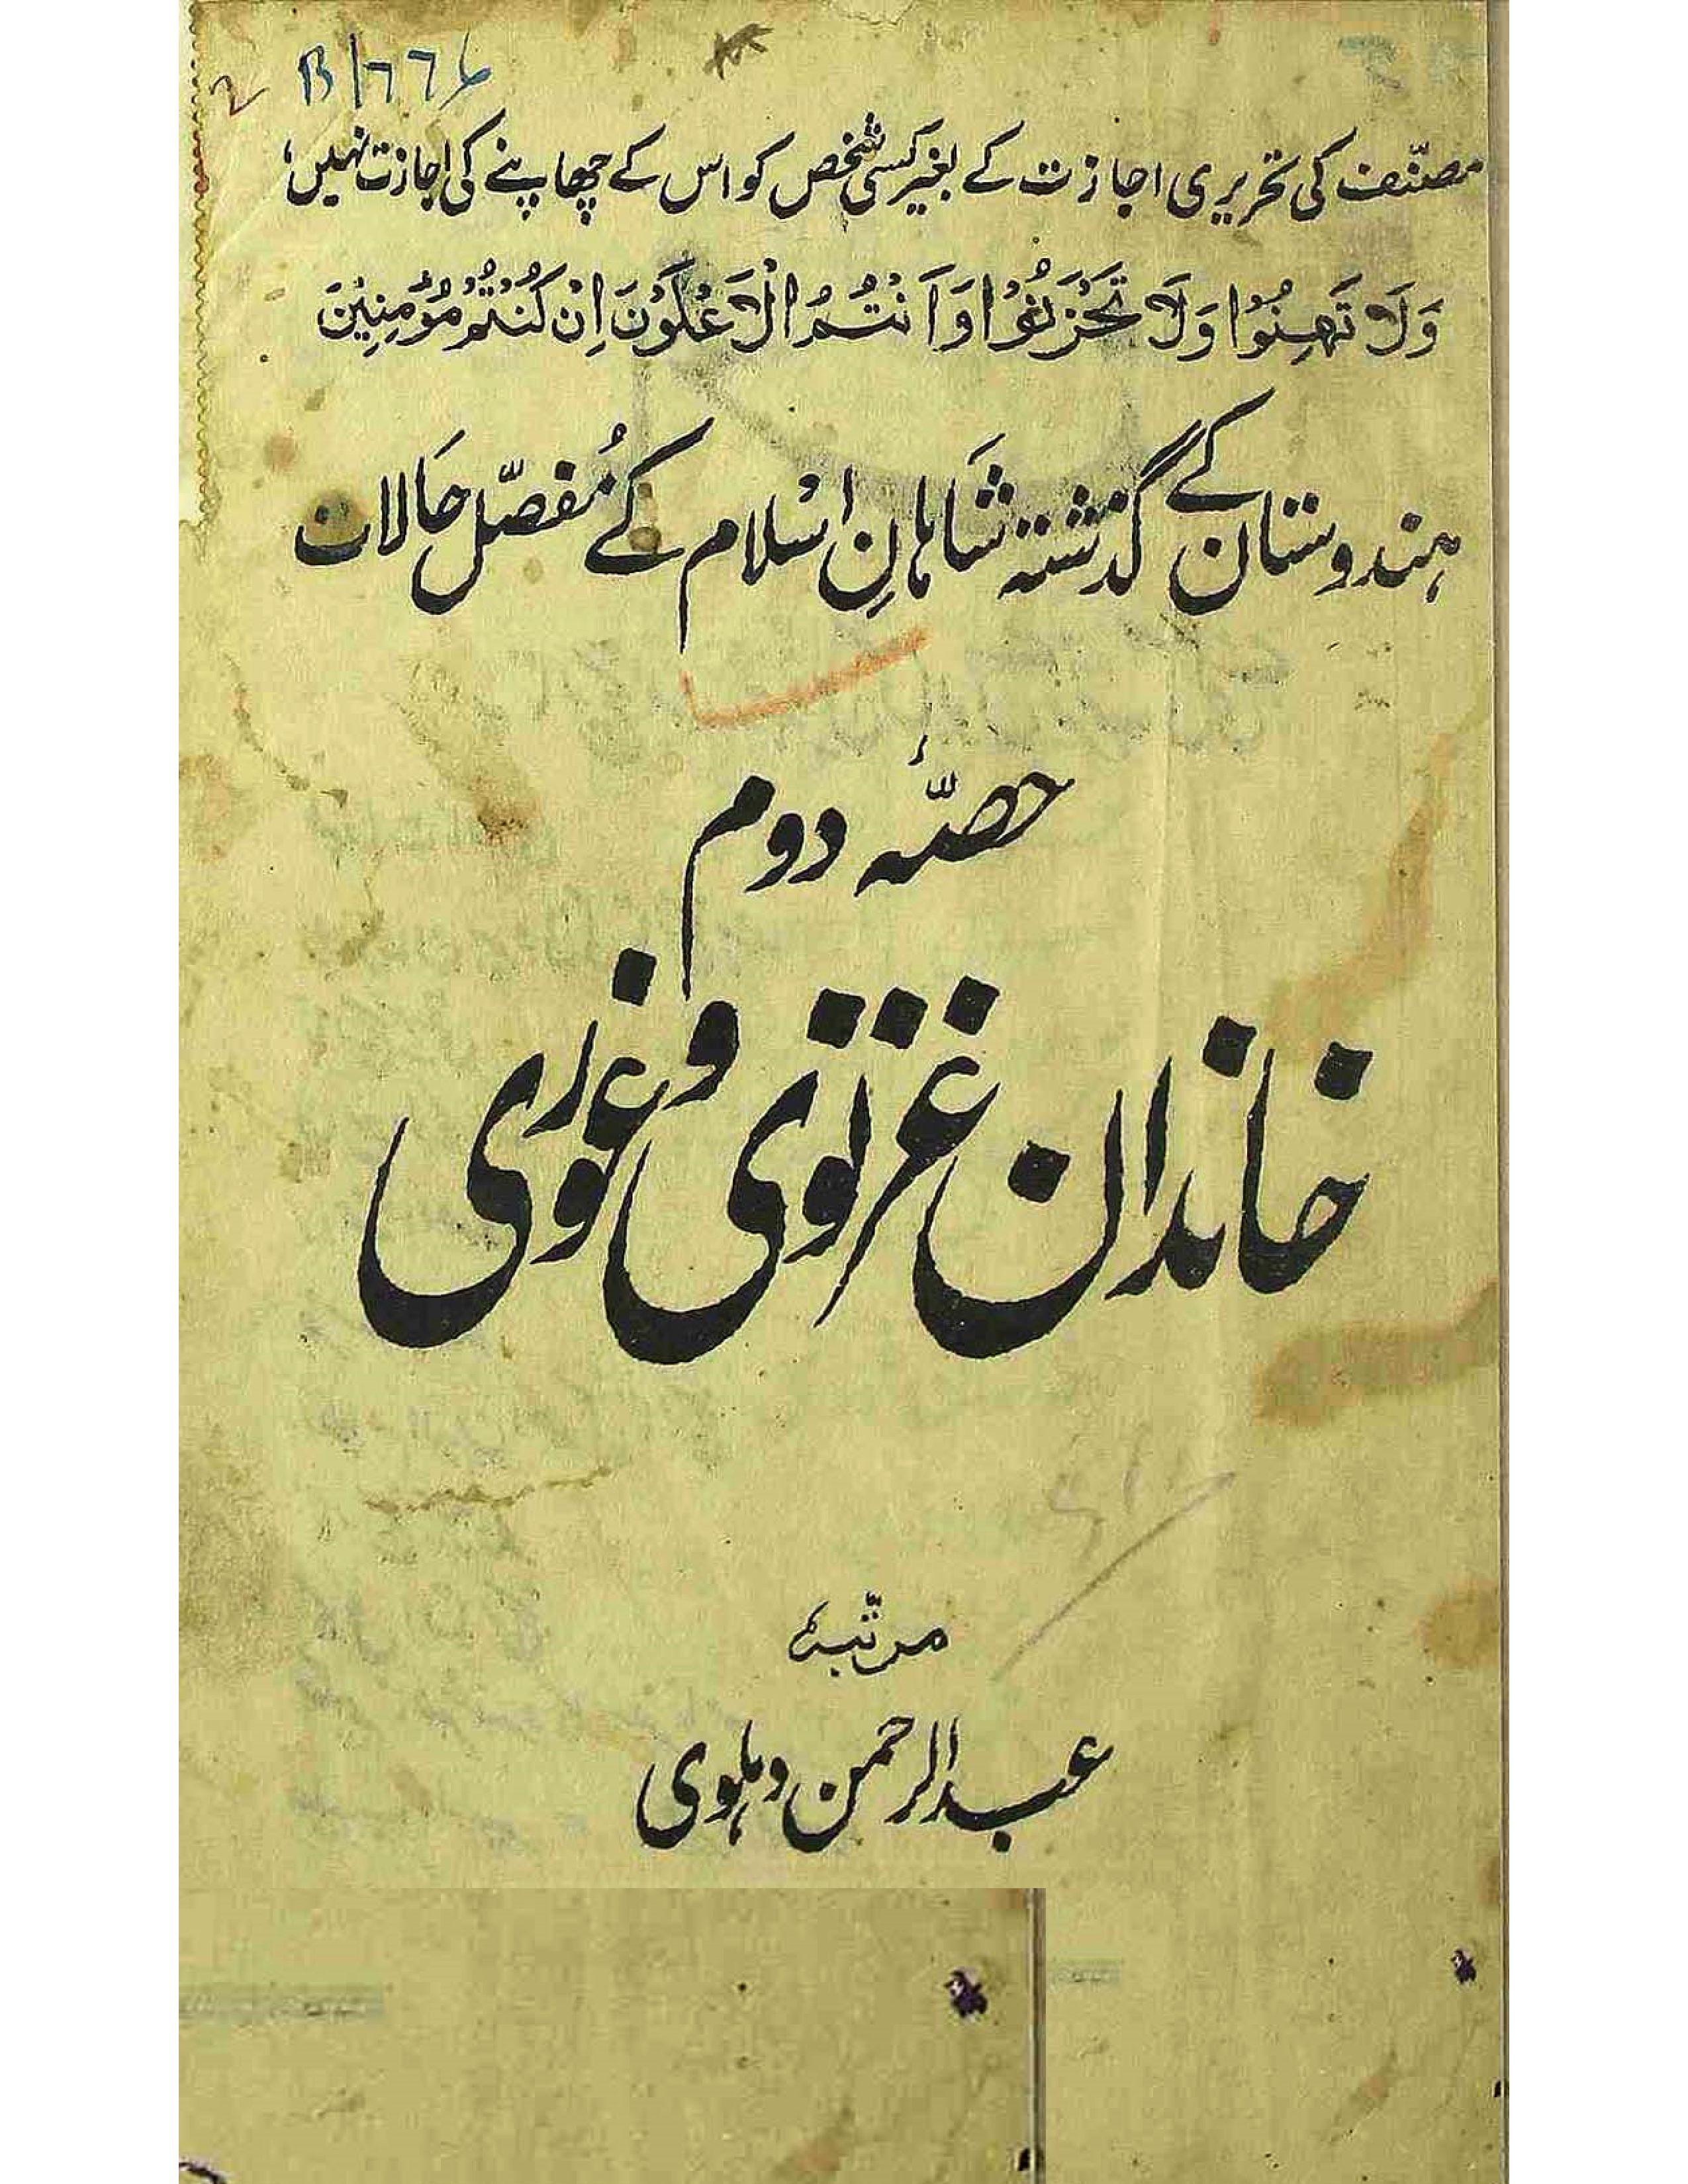 Khandan-e-Ghaznawi-o-Ghauri     Part-002